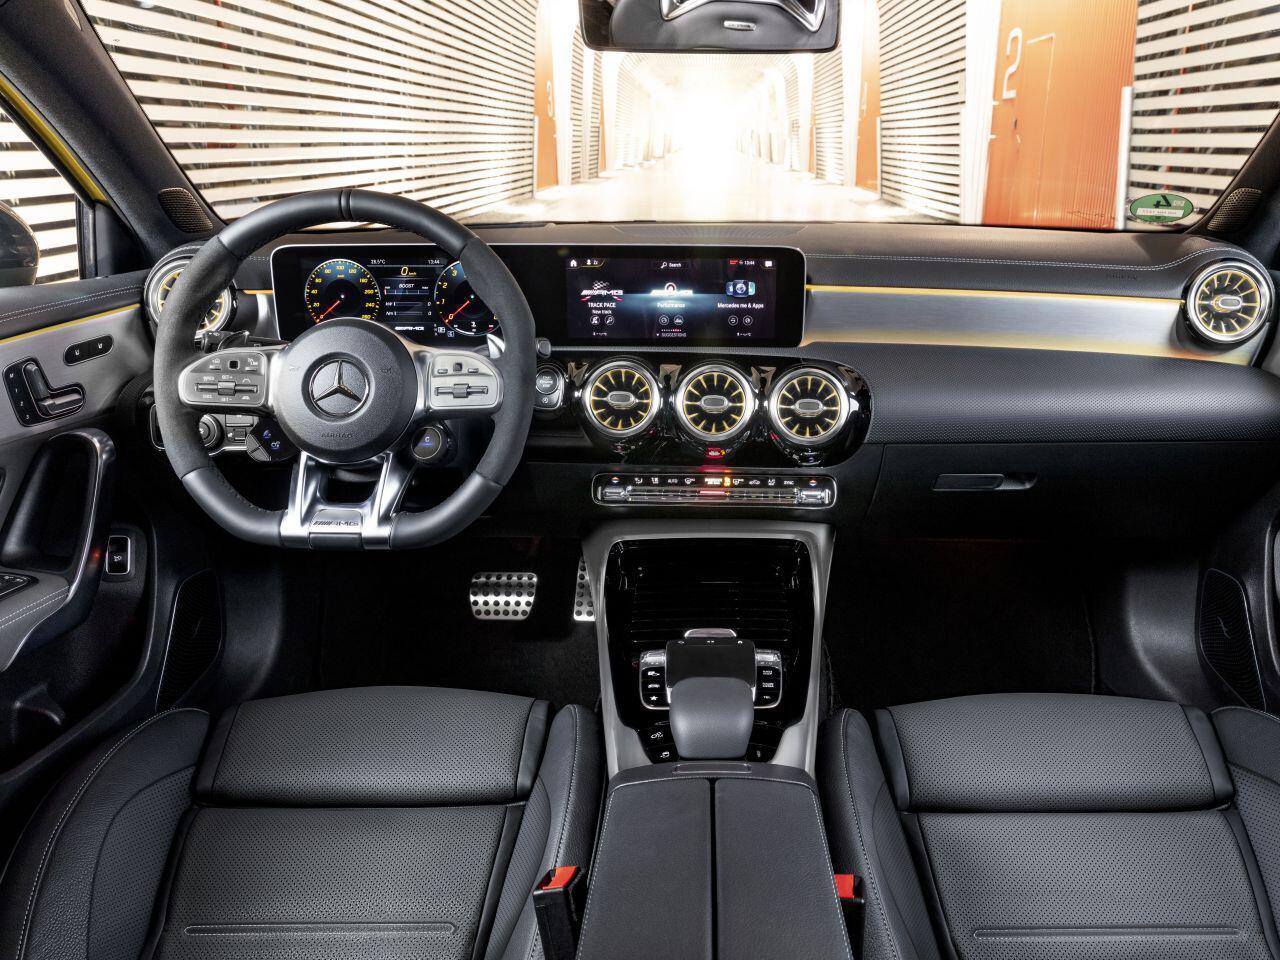 Bild zu Neue AMG Lenkradgeneration